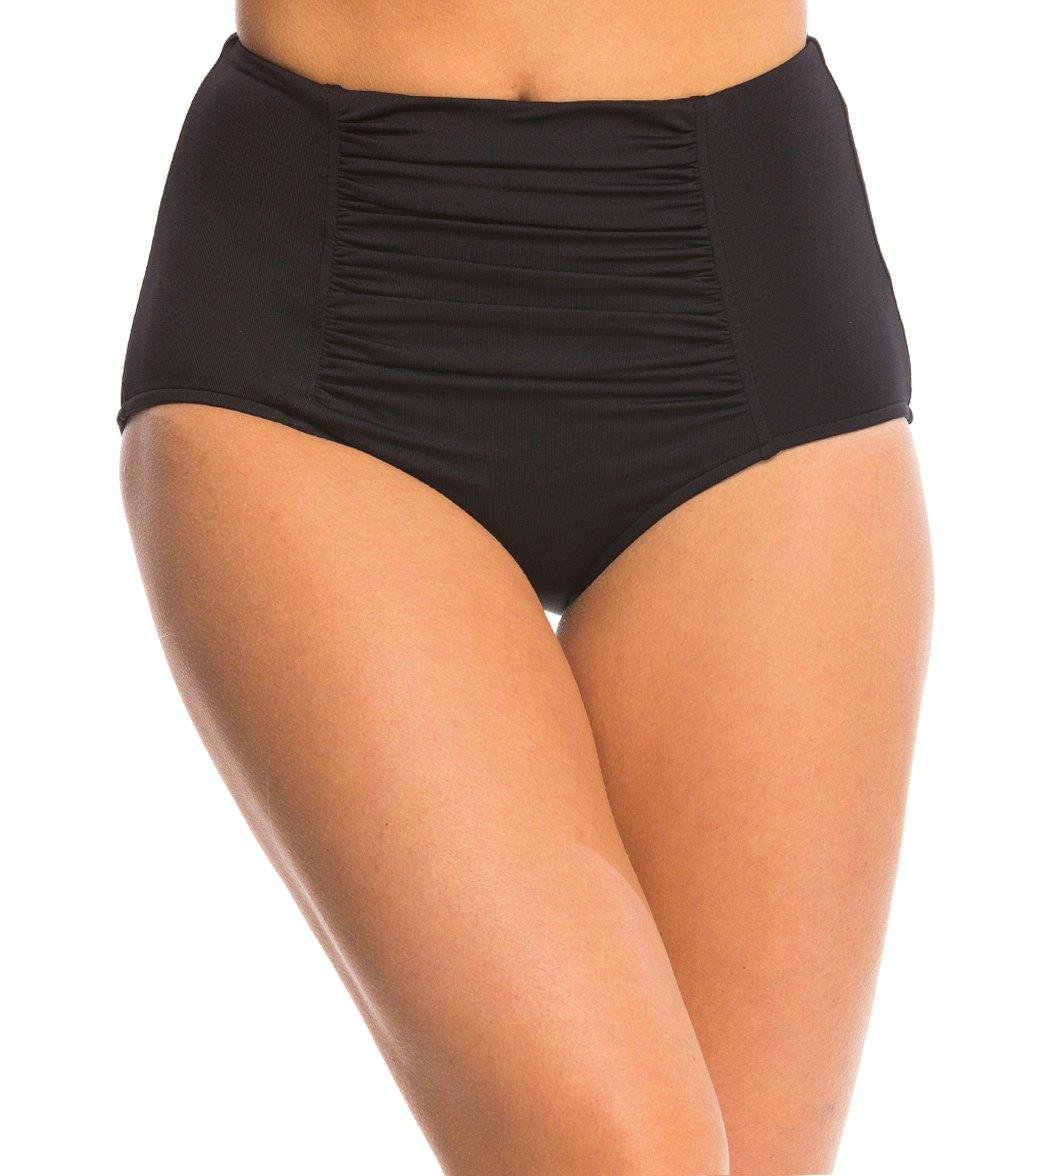 2a05f949f649d Seafolly High Waisted Bikini Bottom at SwimOutlet.com - Free Shipping